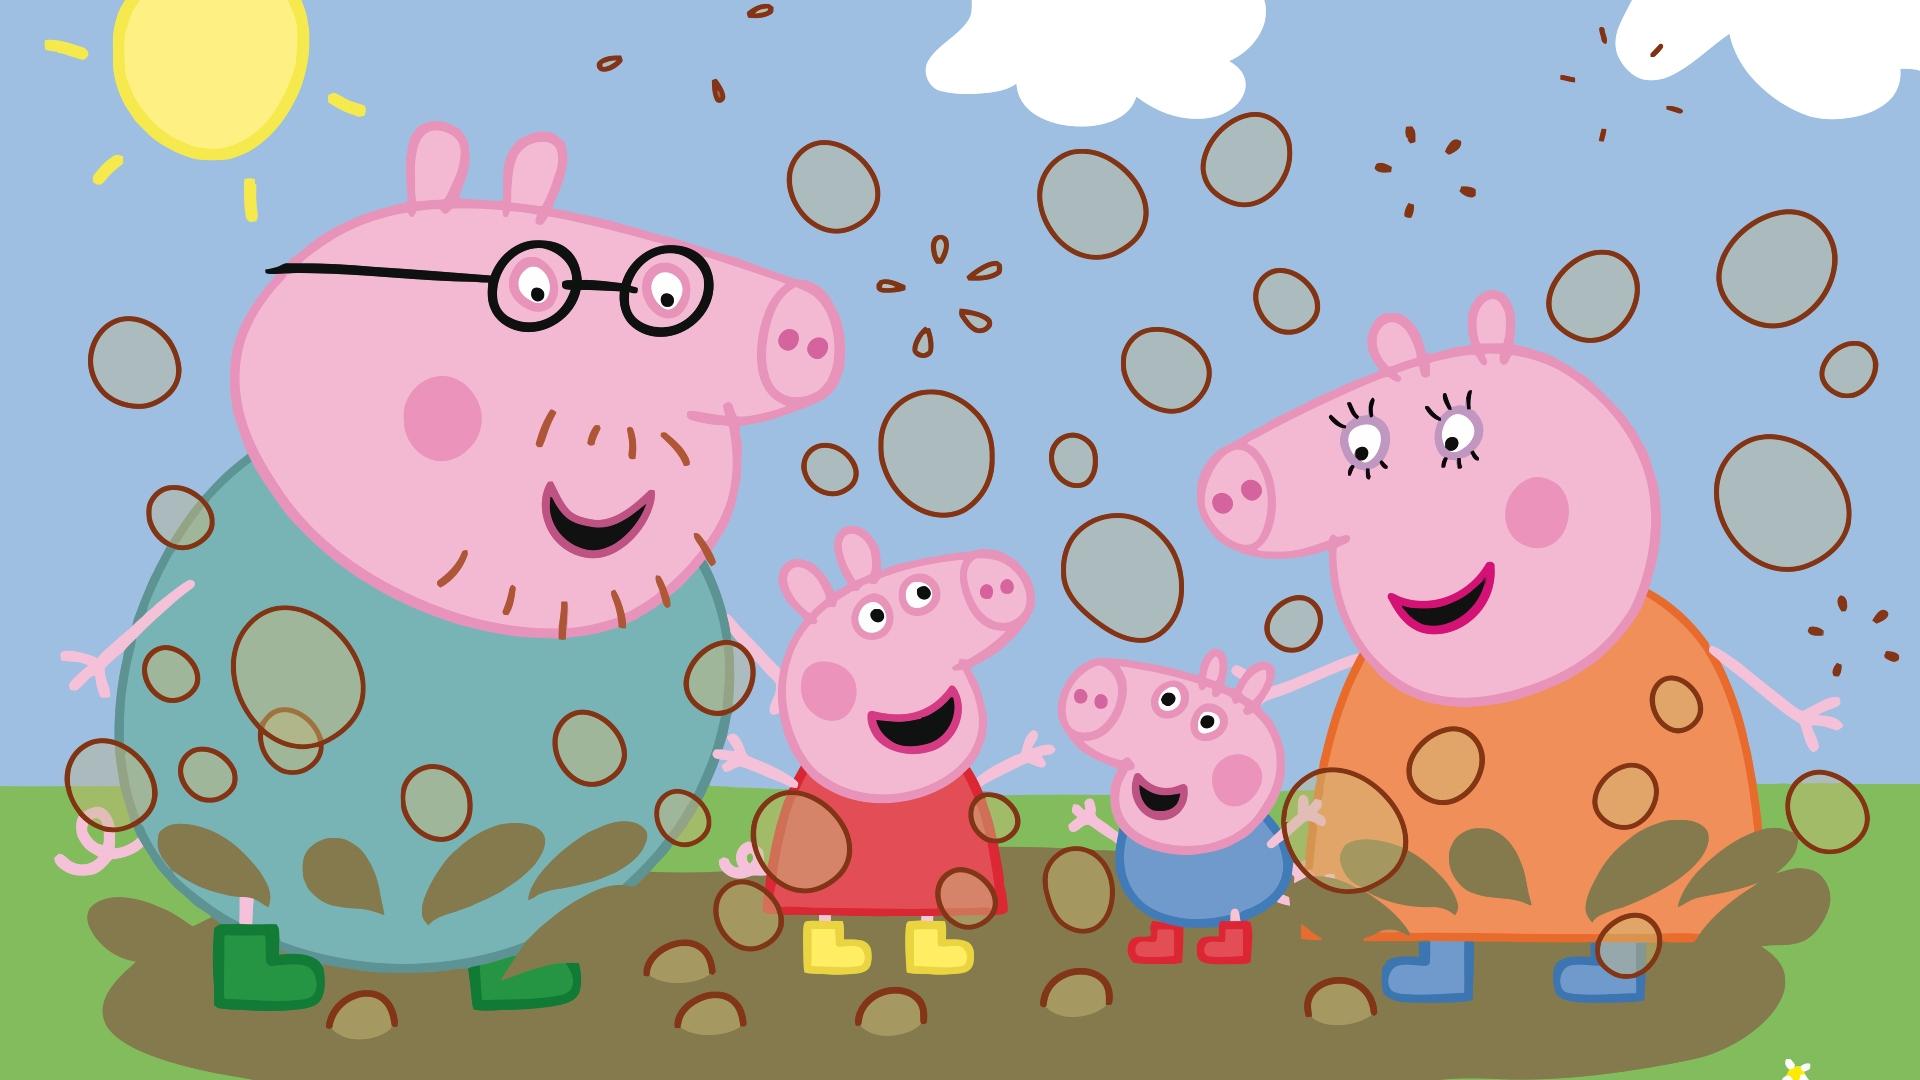 Peppa Pig   Peppa Pig Wallpaper 1920x1080 57156 1920x1080